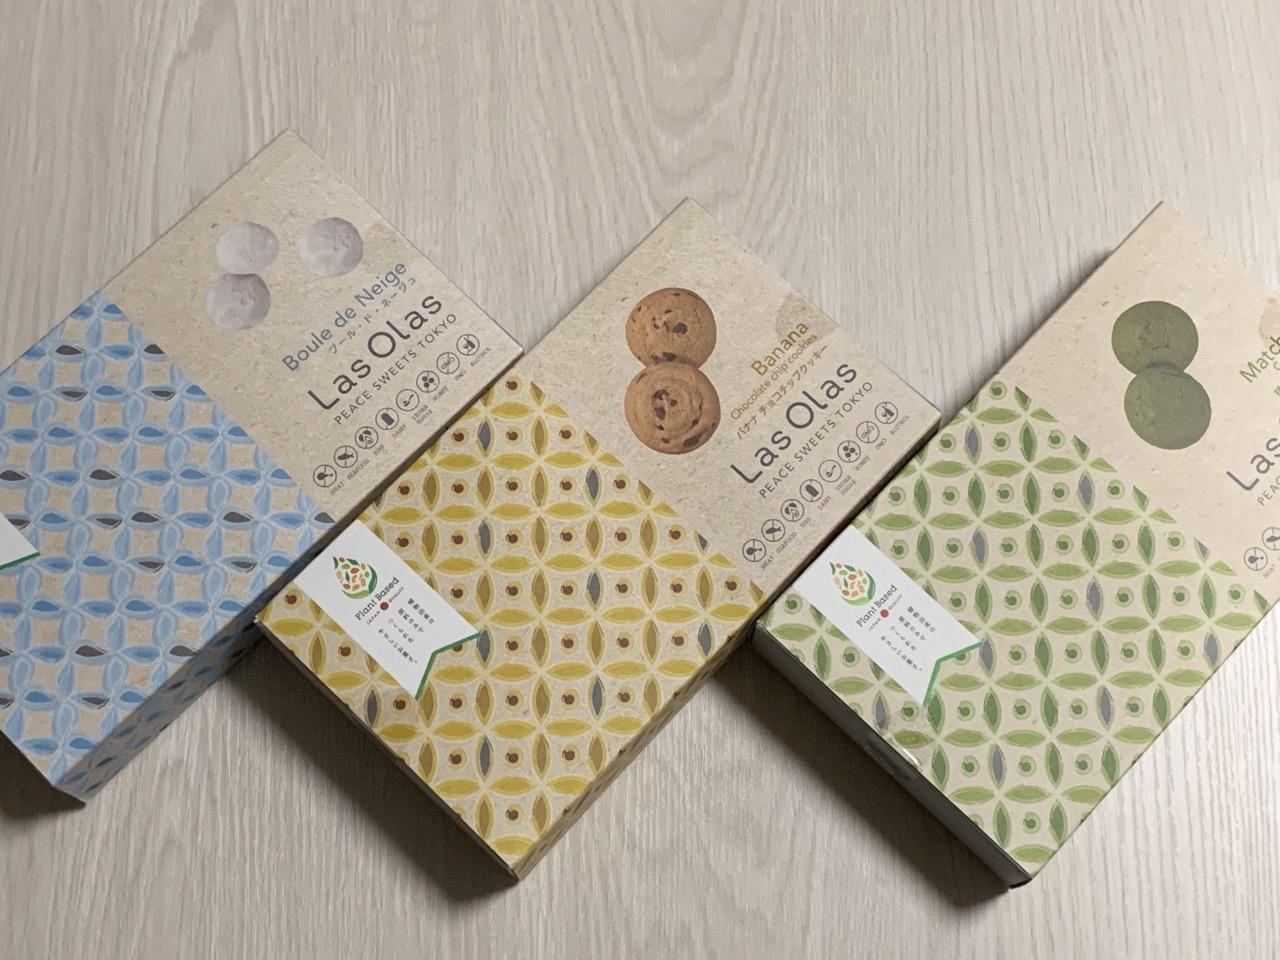 【LasOlas】(ラスオラス)のお菓子3種